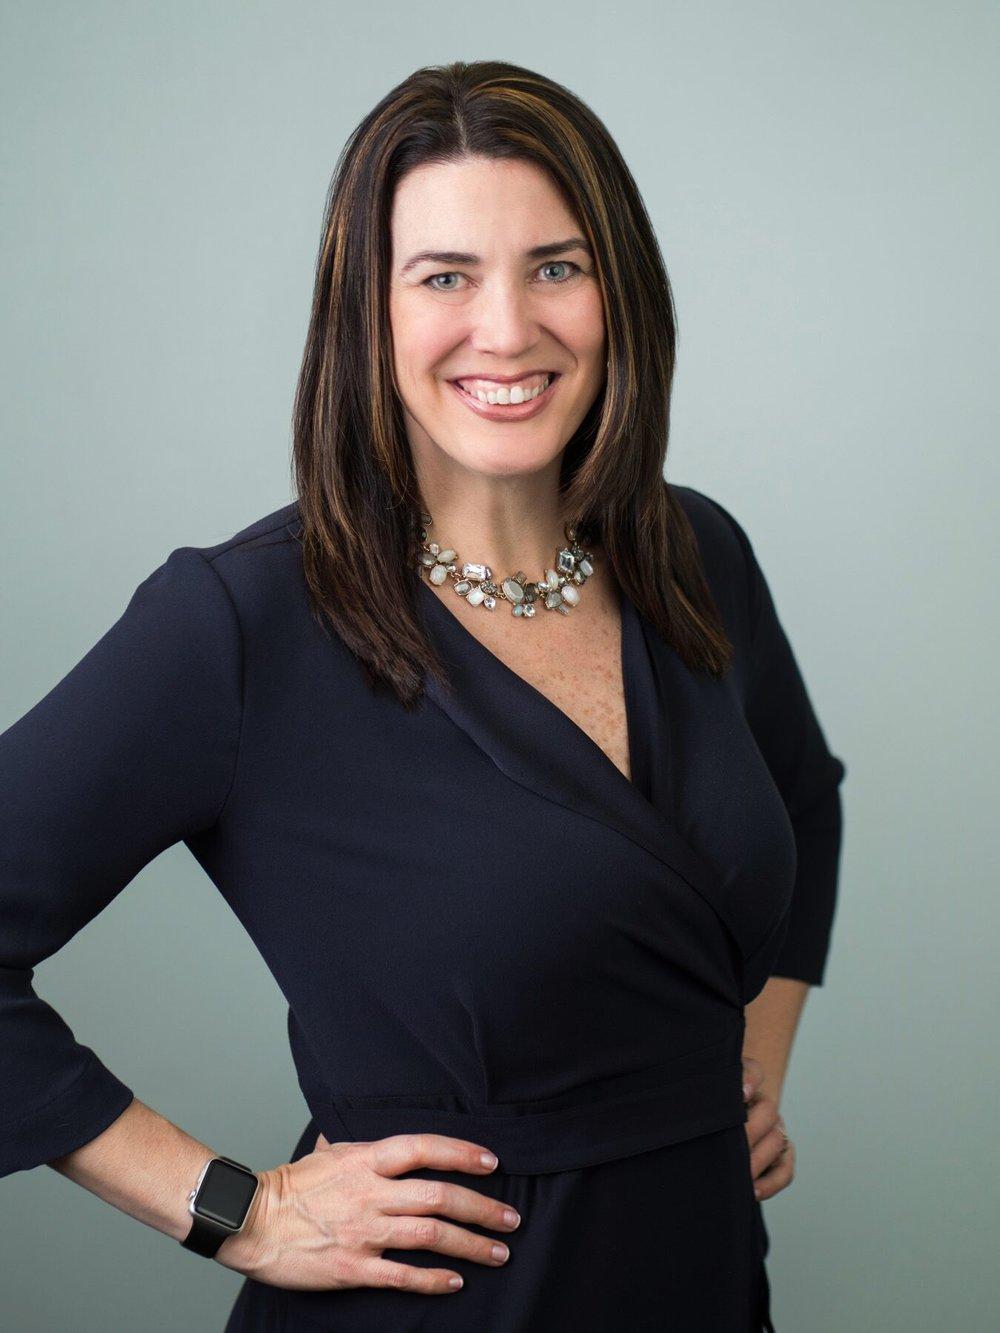 Dr. Brandie Nemchenko